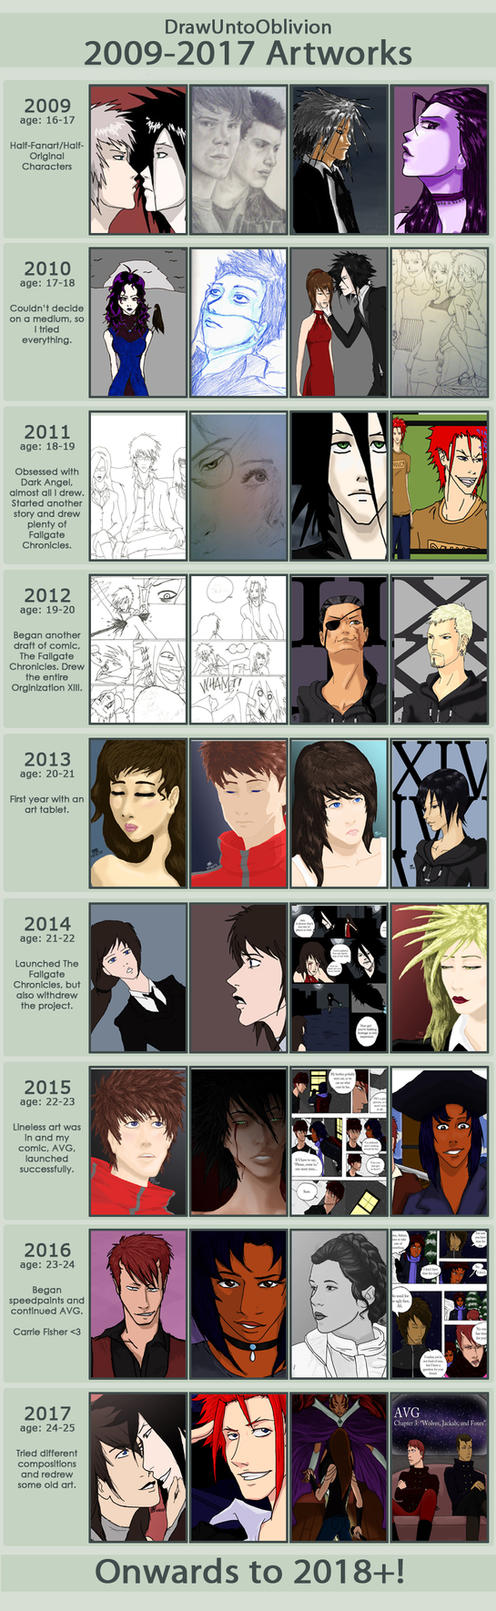 Improvement meme 2009 to 2017 by DrawUntoOblivion